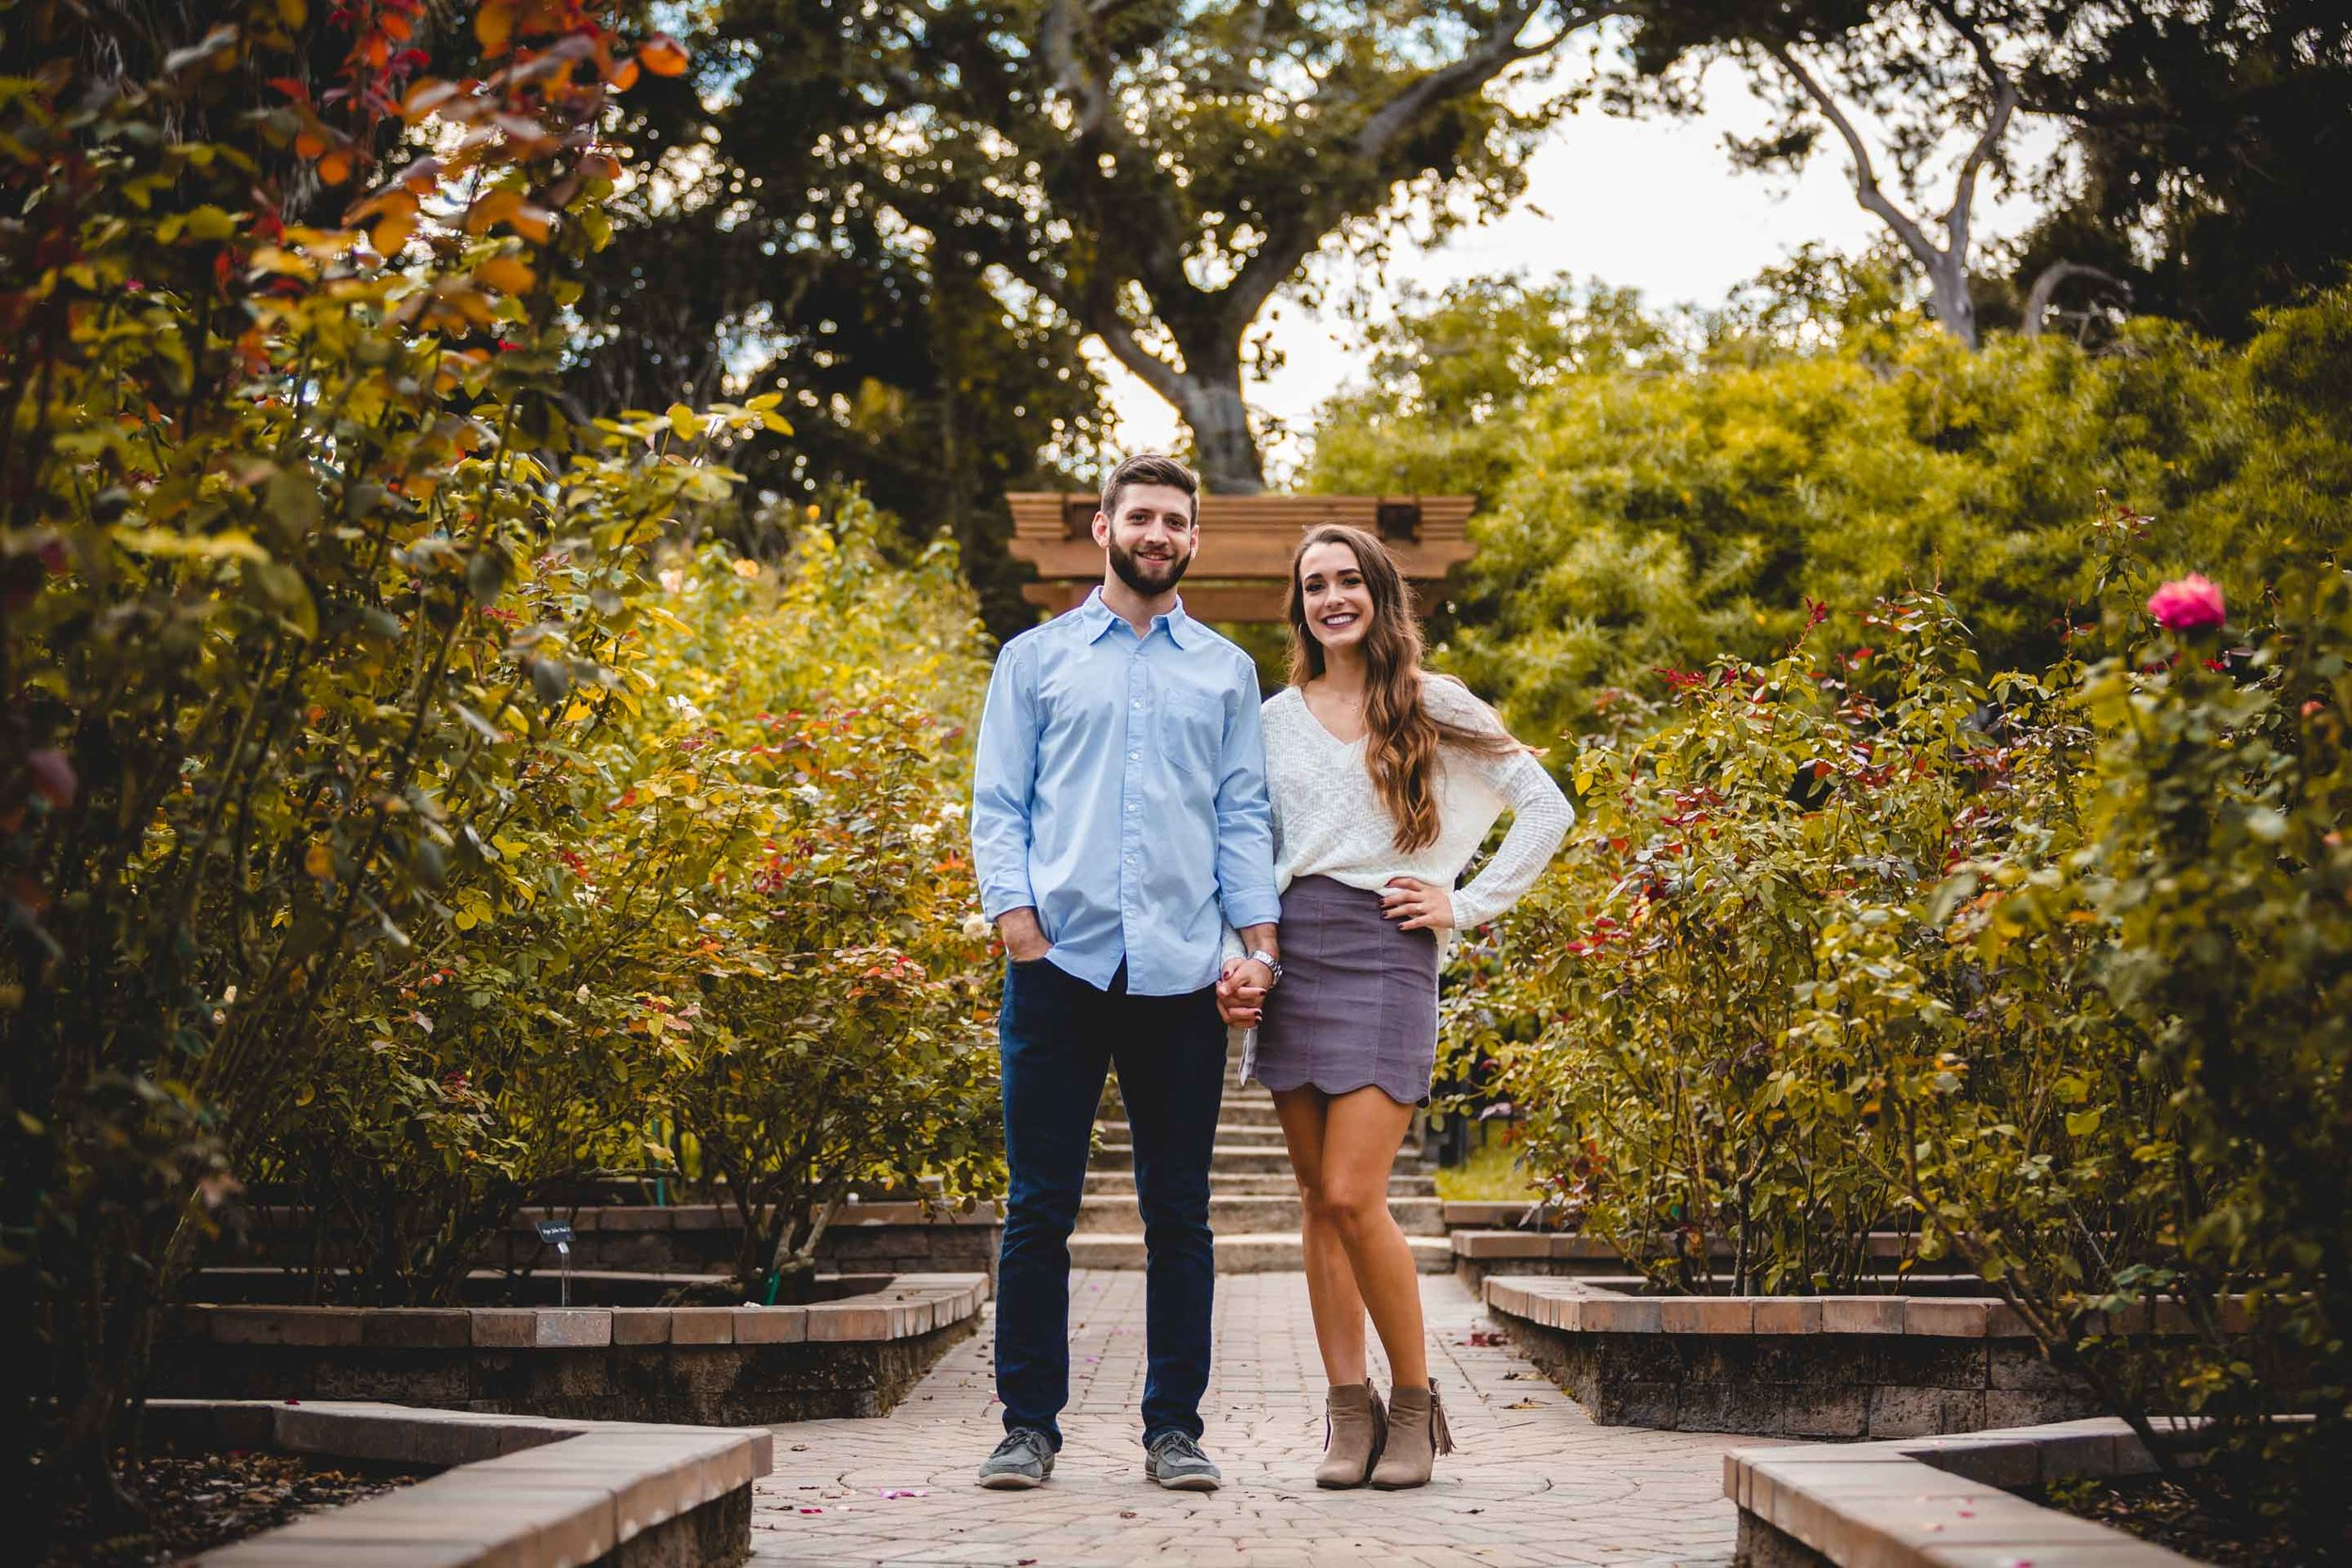 adam-szarmack-jacksonville-wedding-photographer-palm-coast-washing-oaks-garden-state-park-engagement-23.jpg